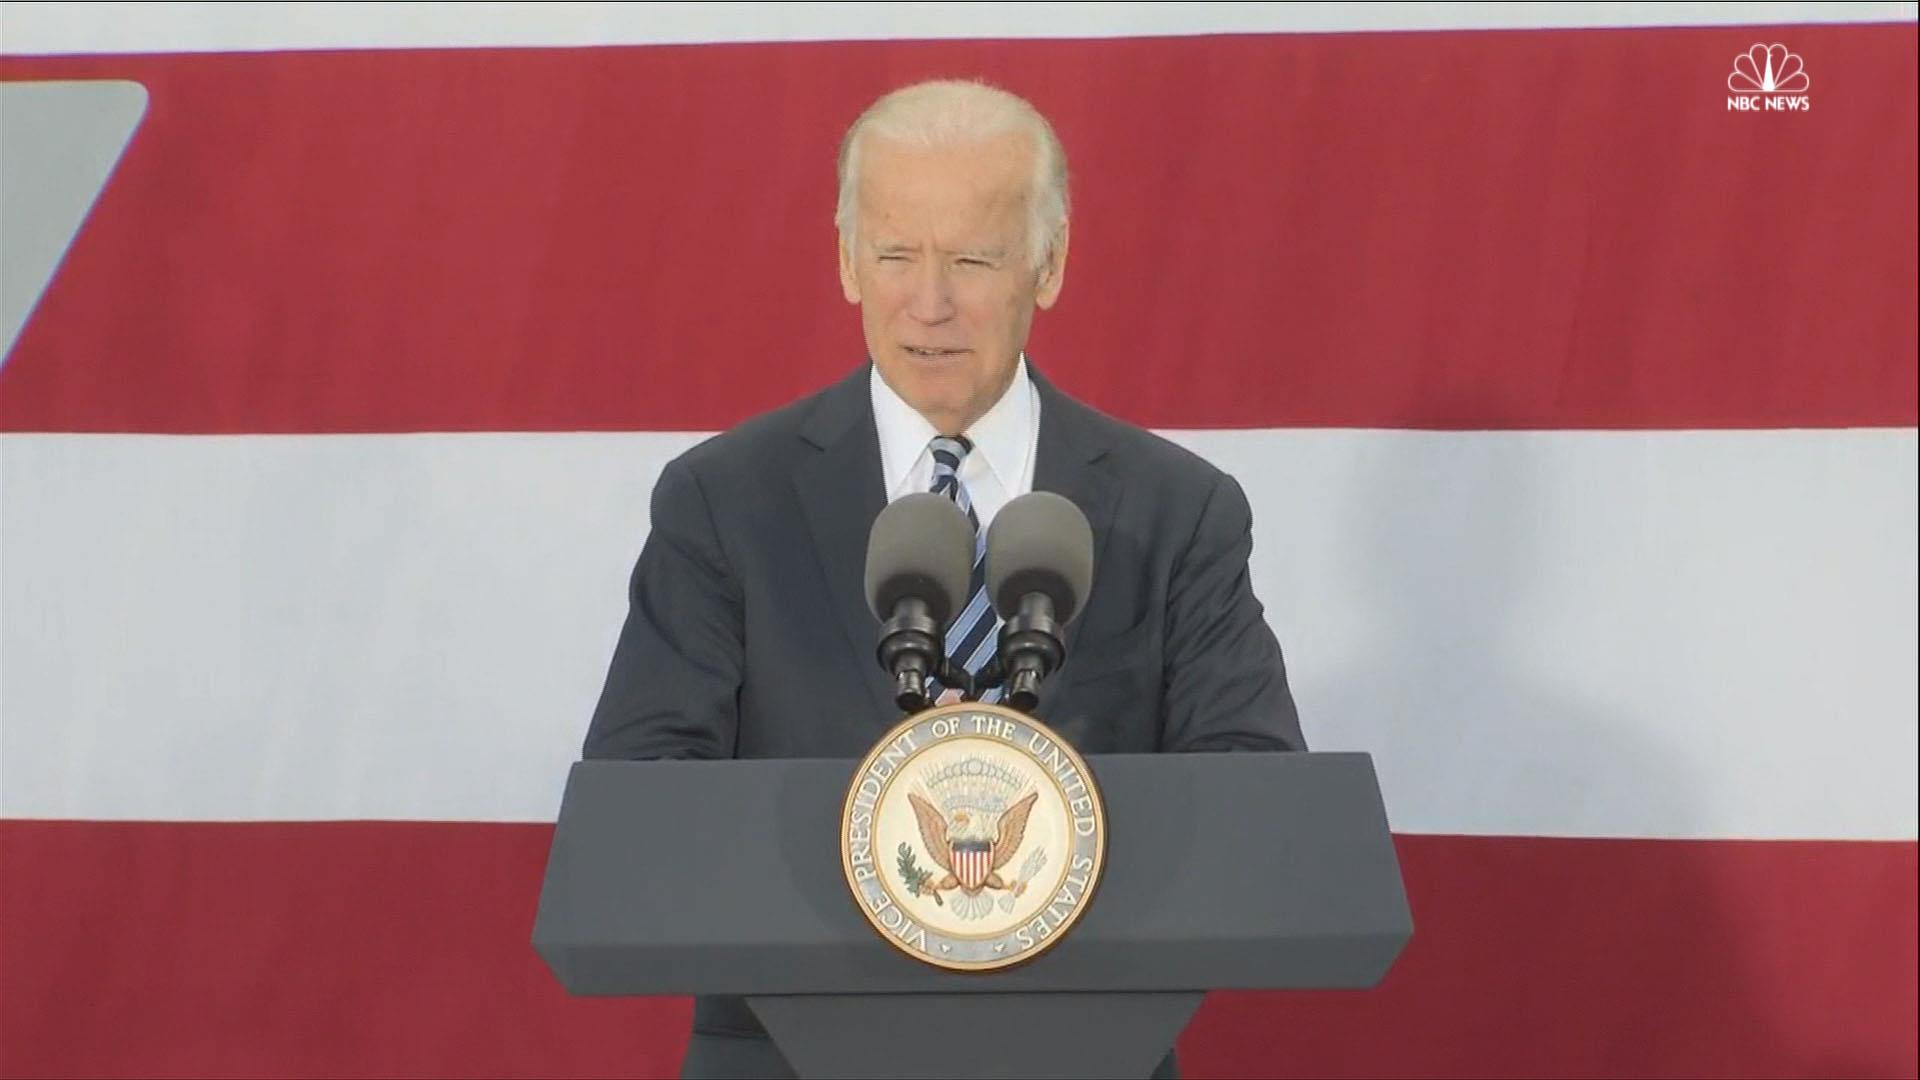 Biden focuses on down-ballot race in Ohio